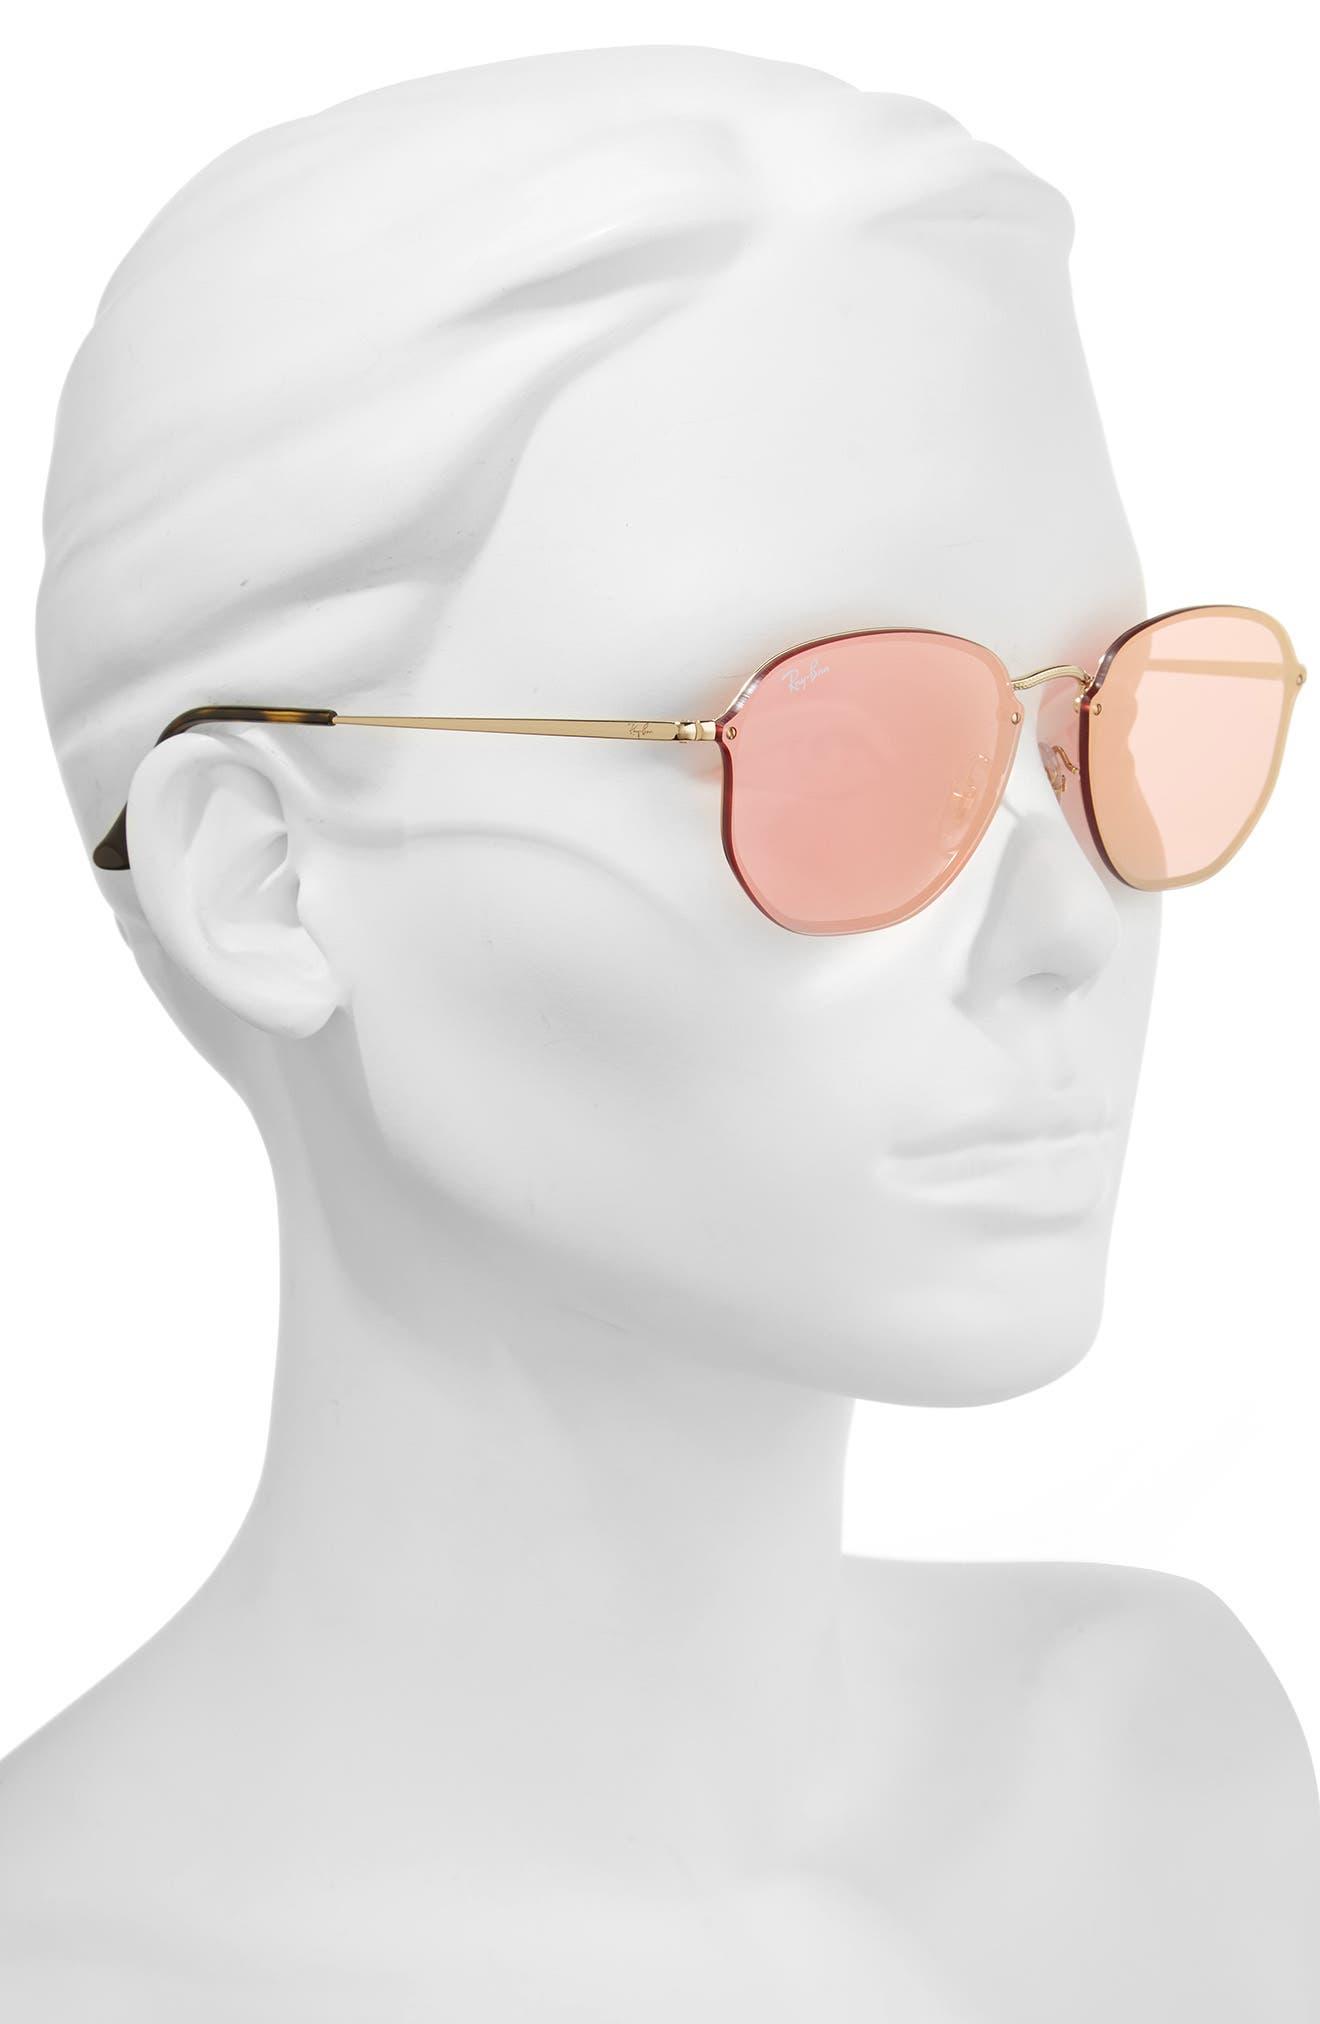 58mm Round Sunglasses,                             Alternate thumbnail 4, color,